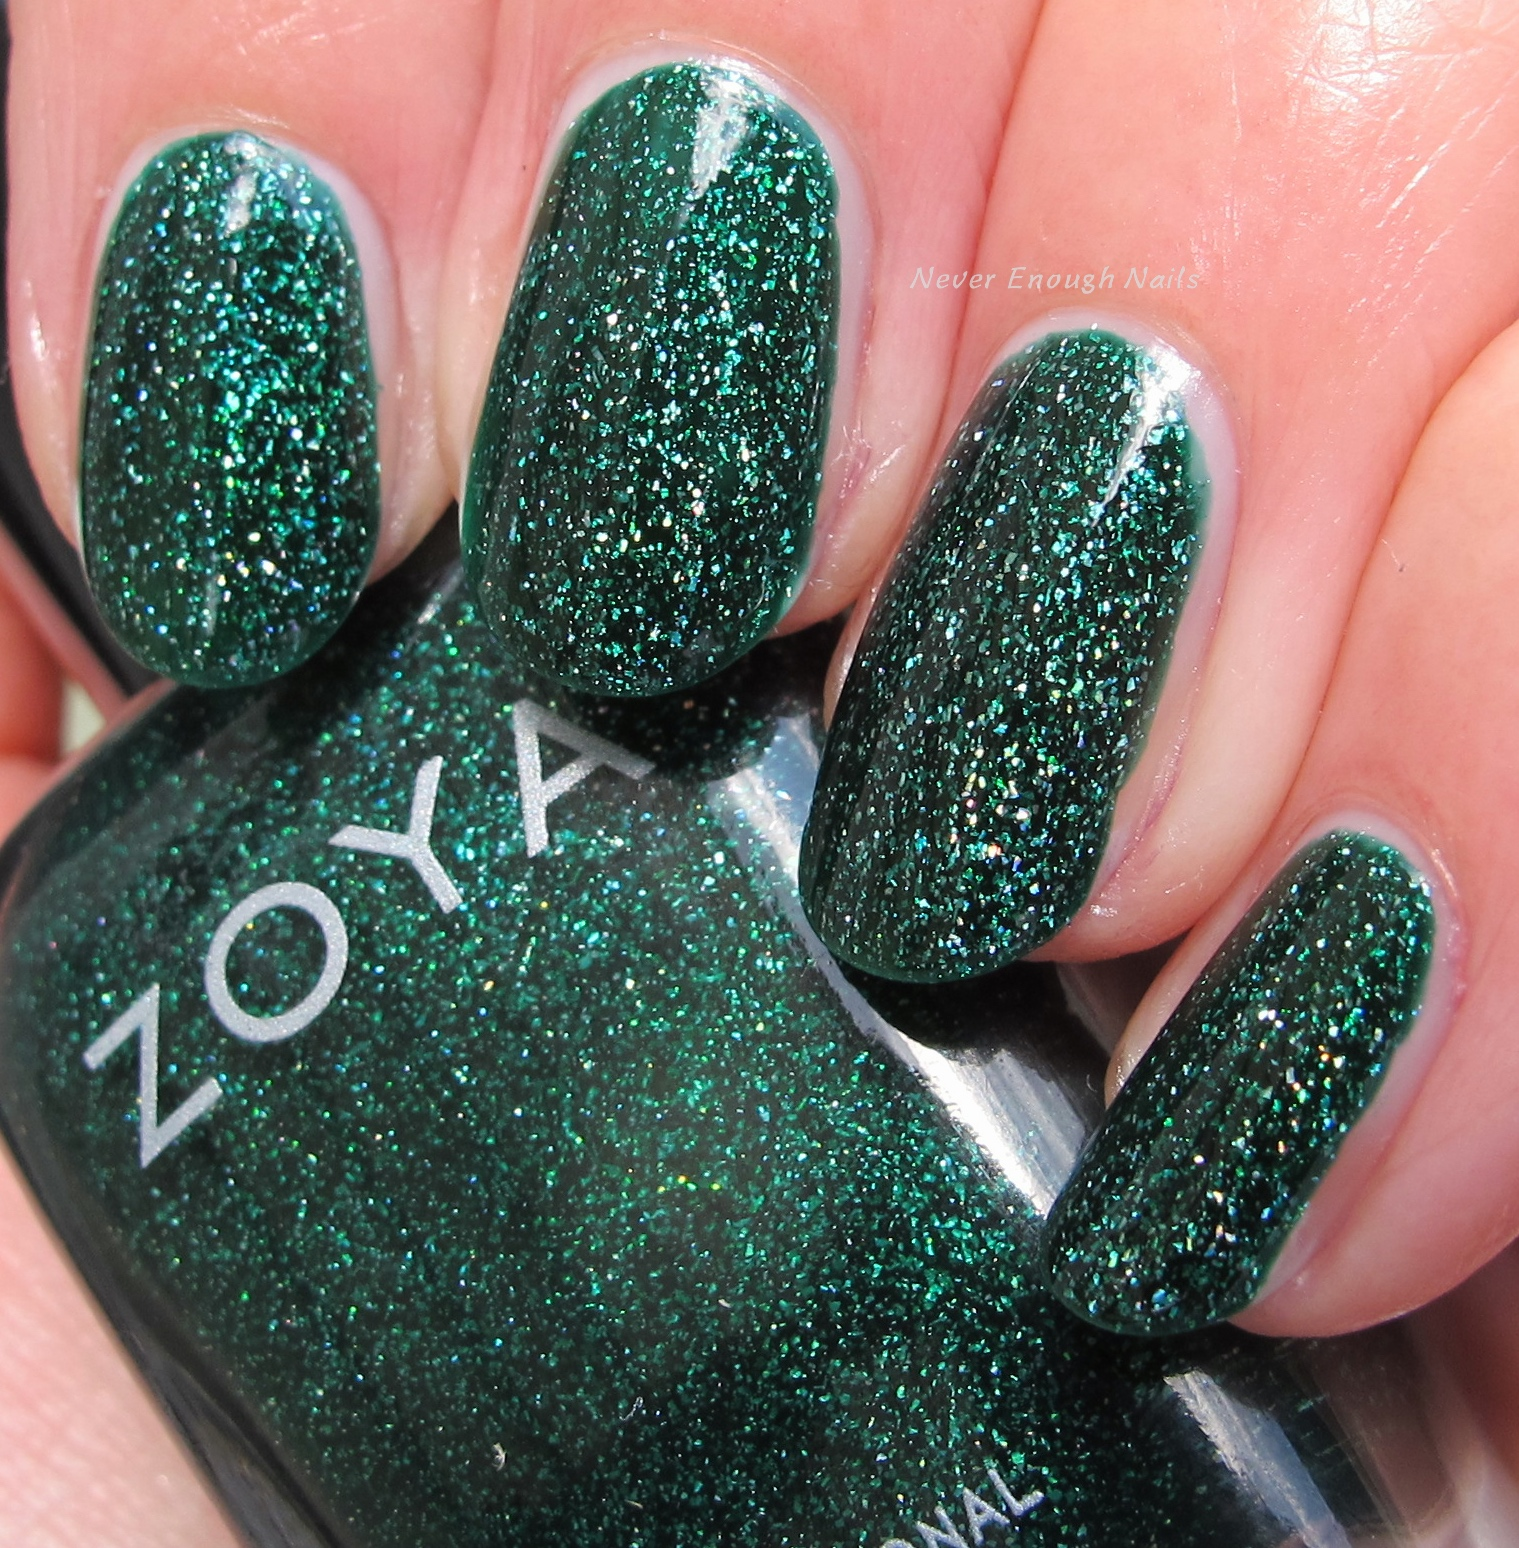 Never Enough Nails: Zoya Urban Grunge Metallics & Holos Fall/Winter ...